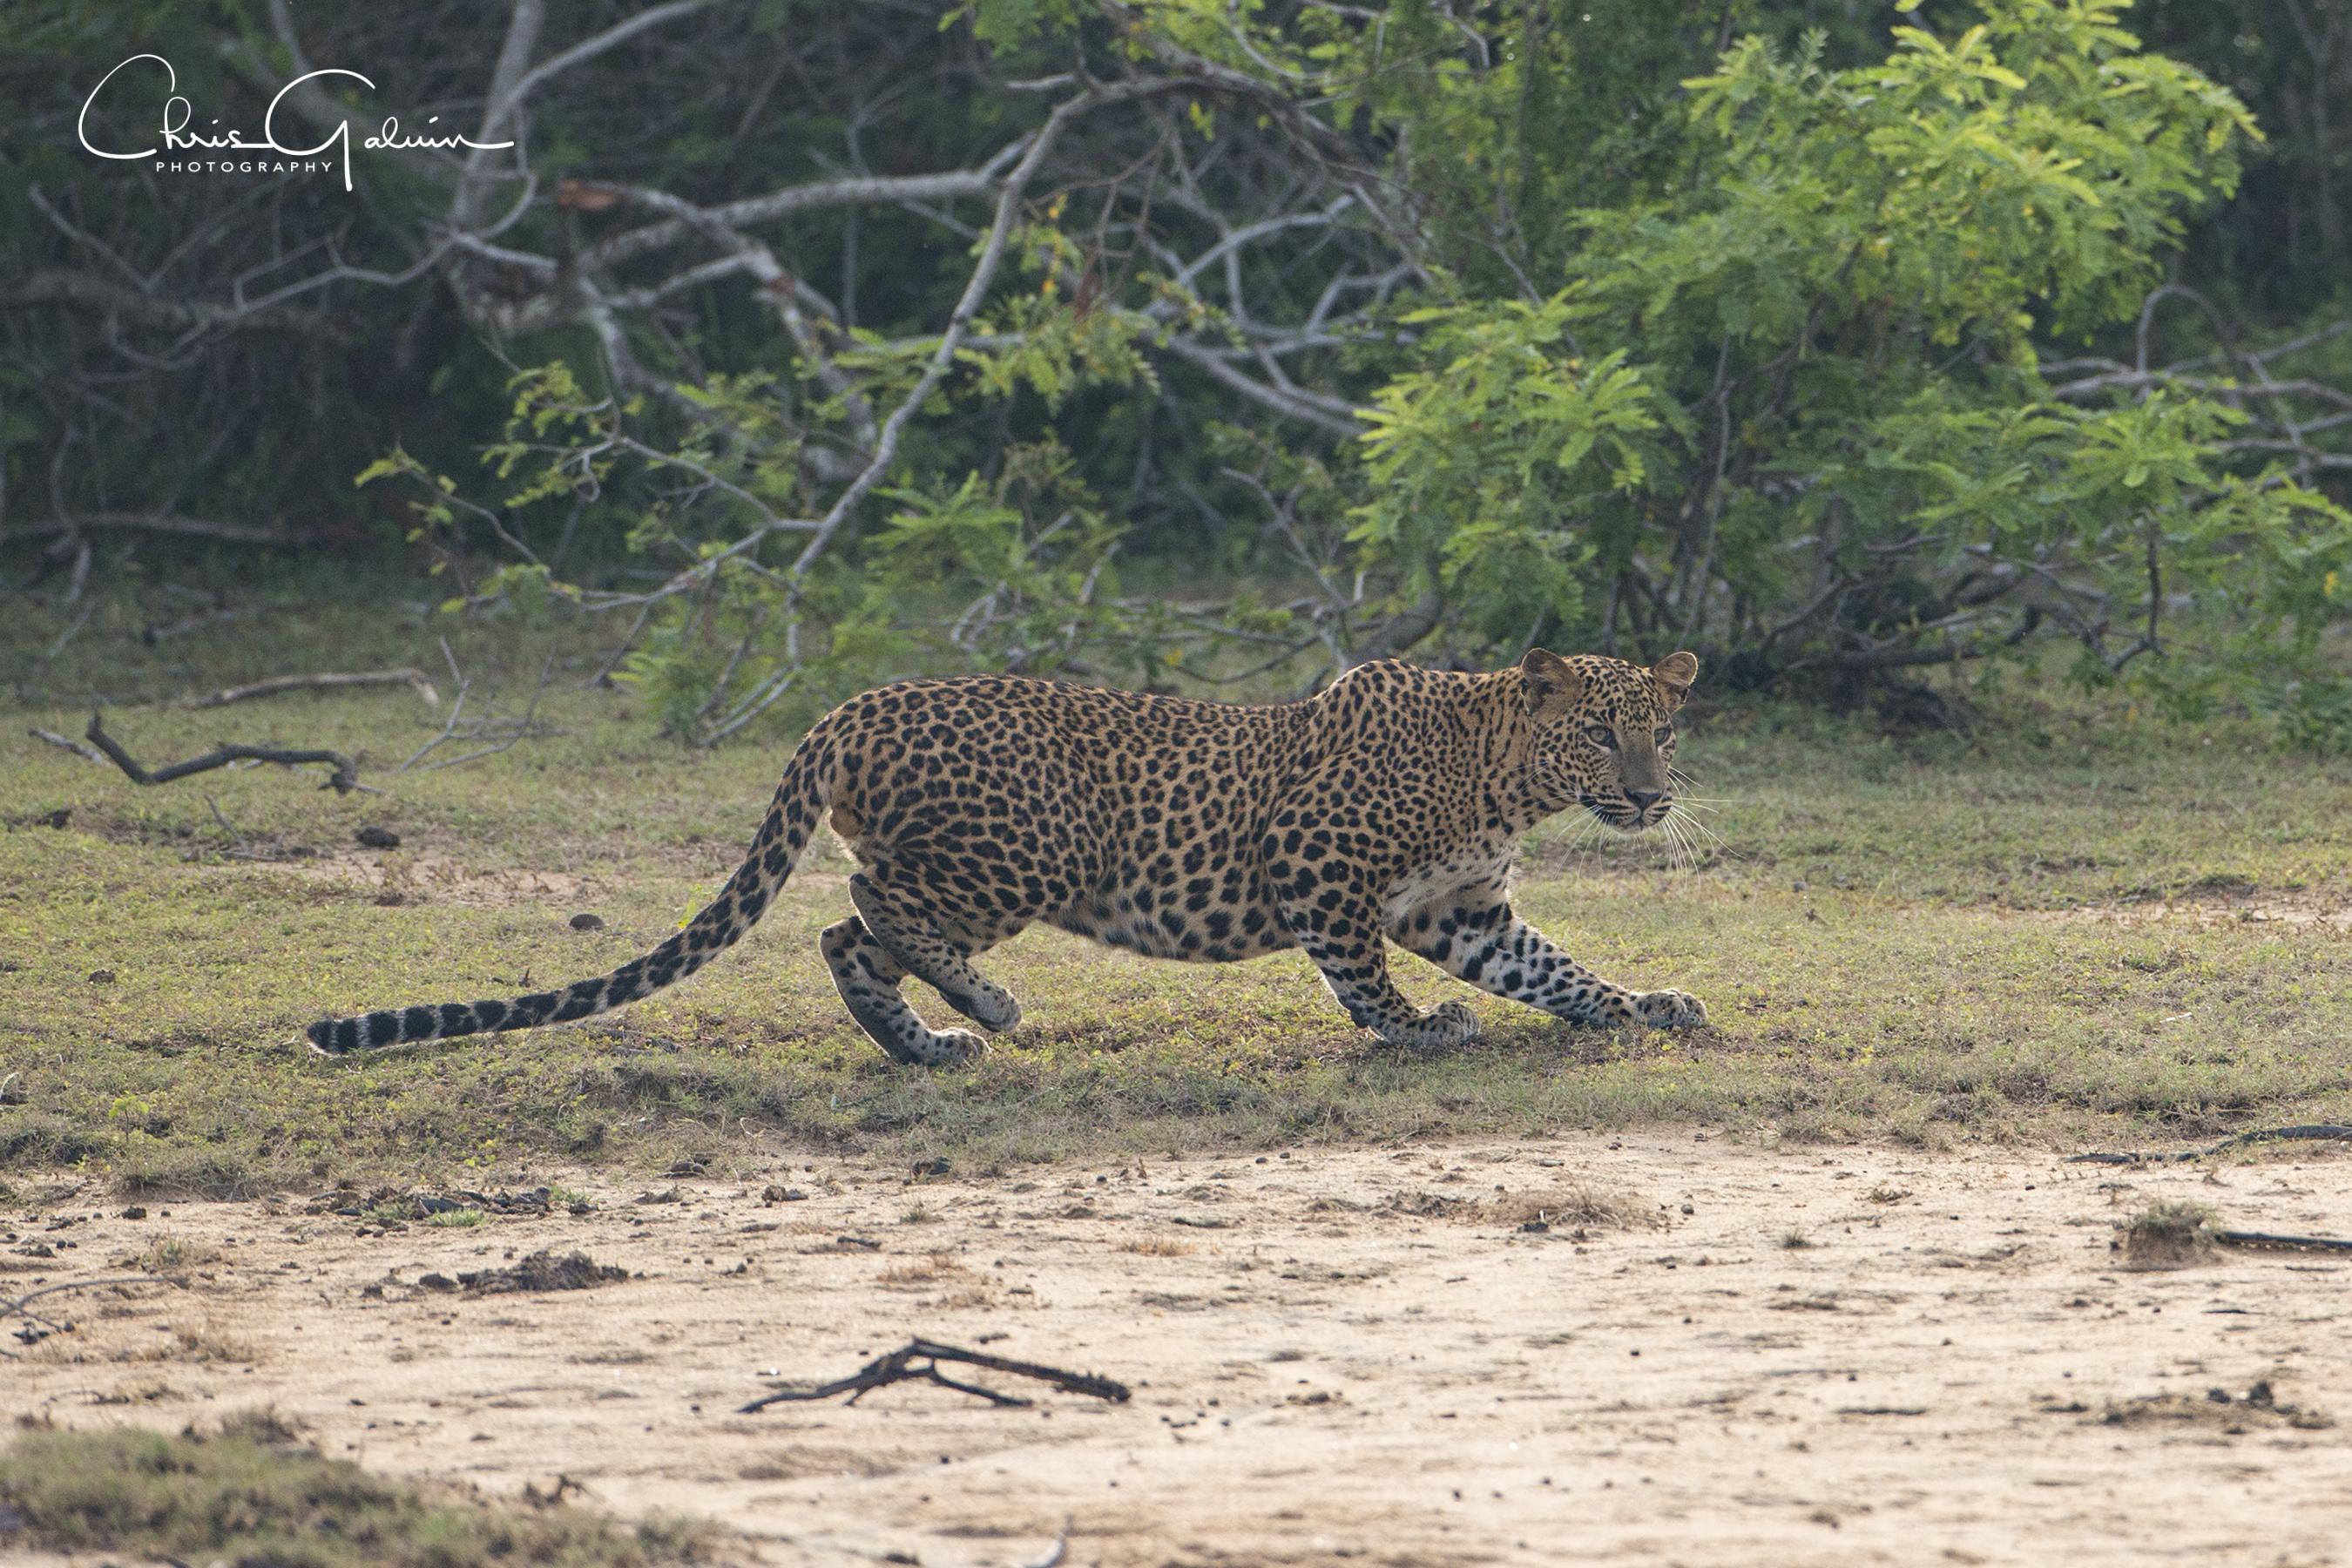 Leopard 9520